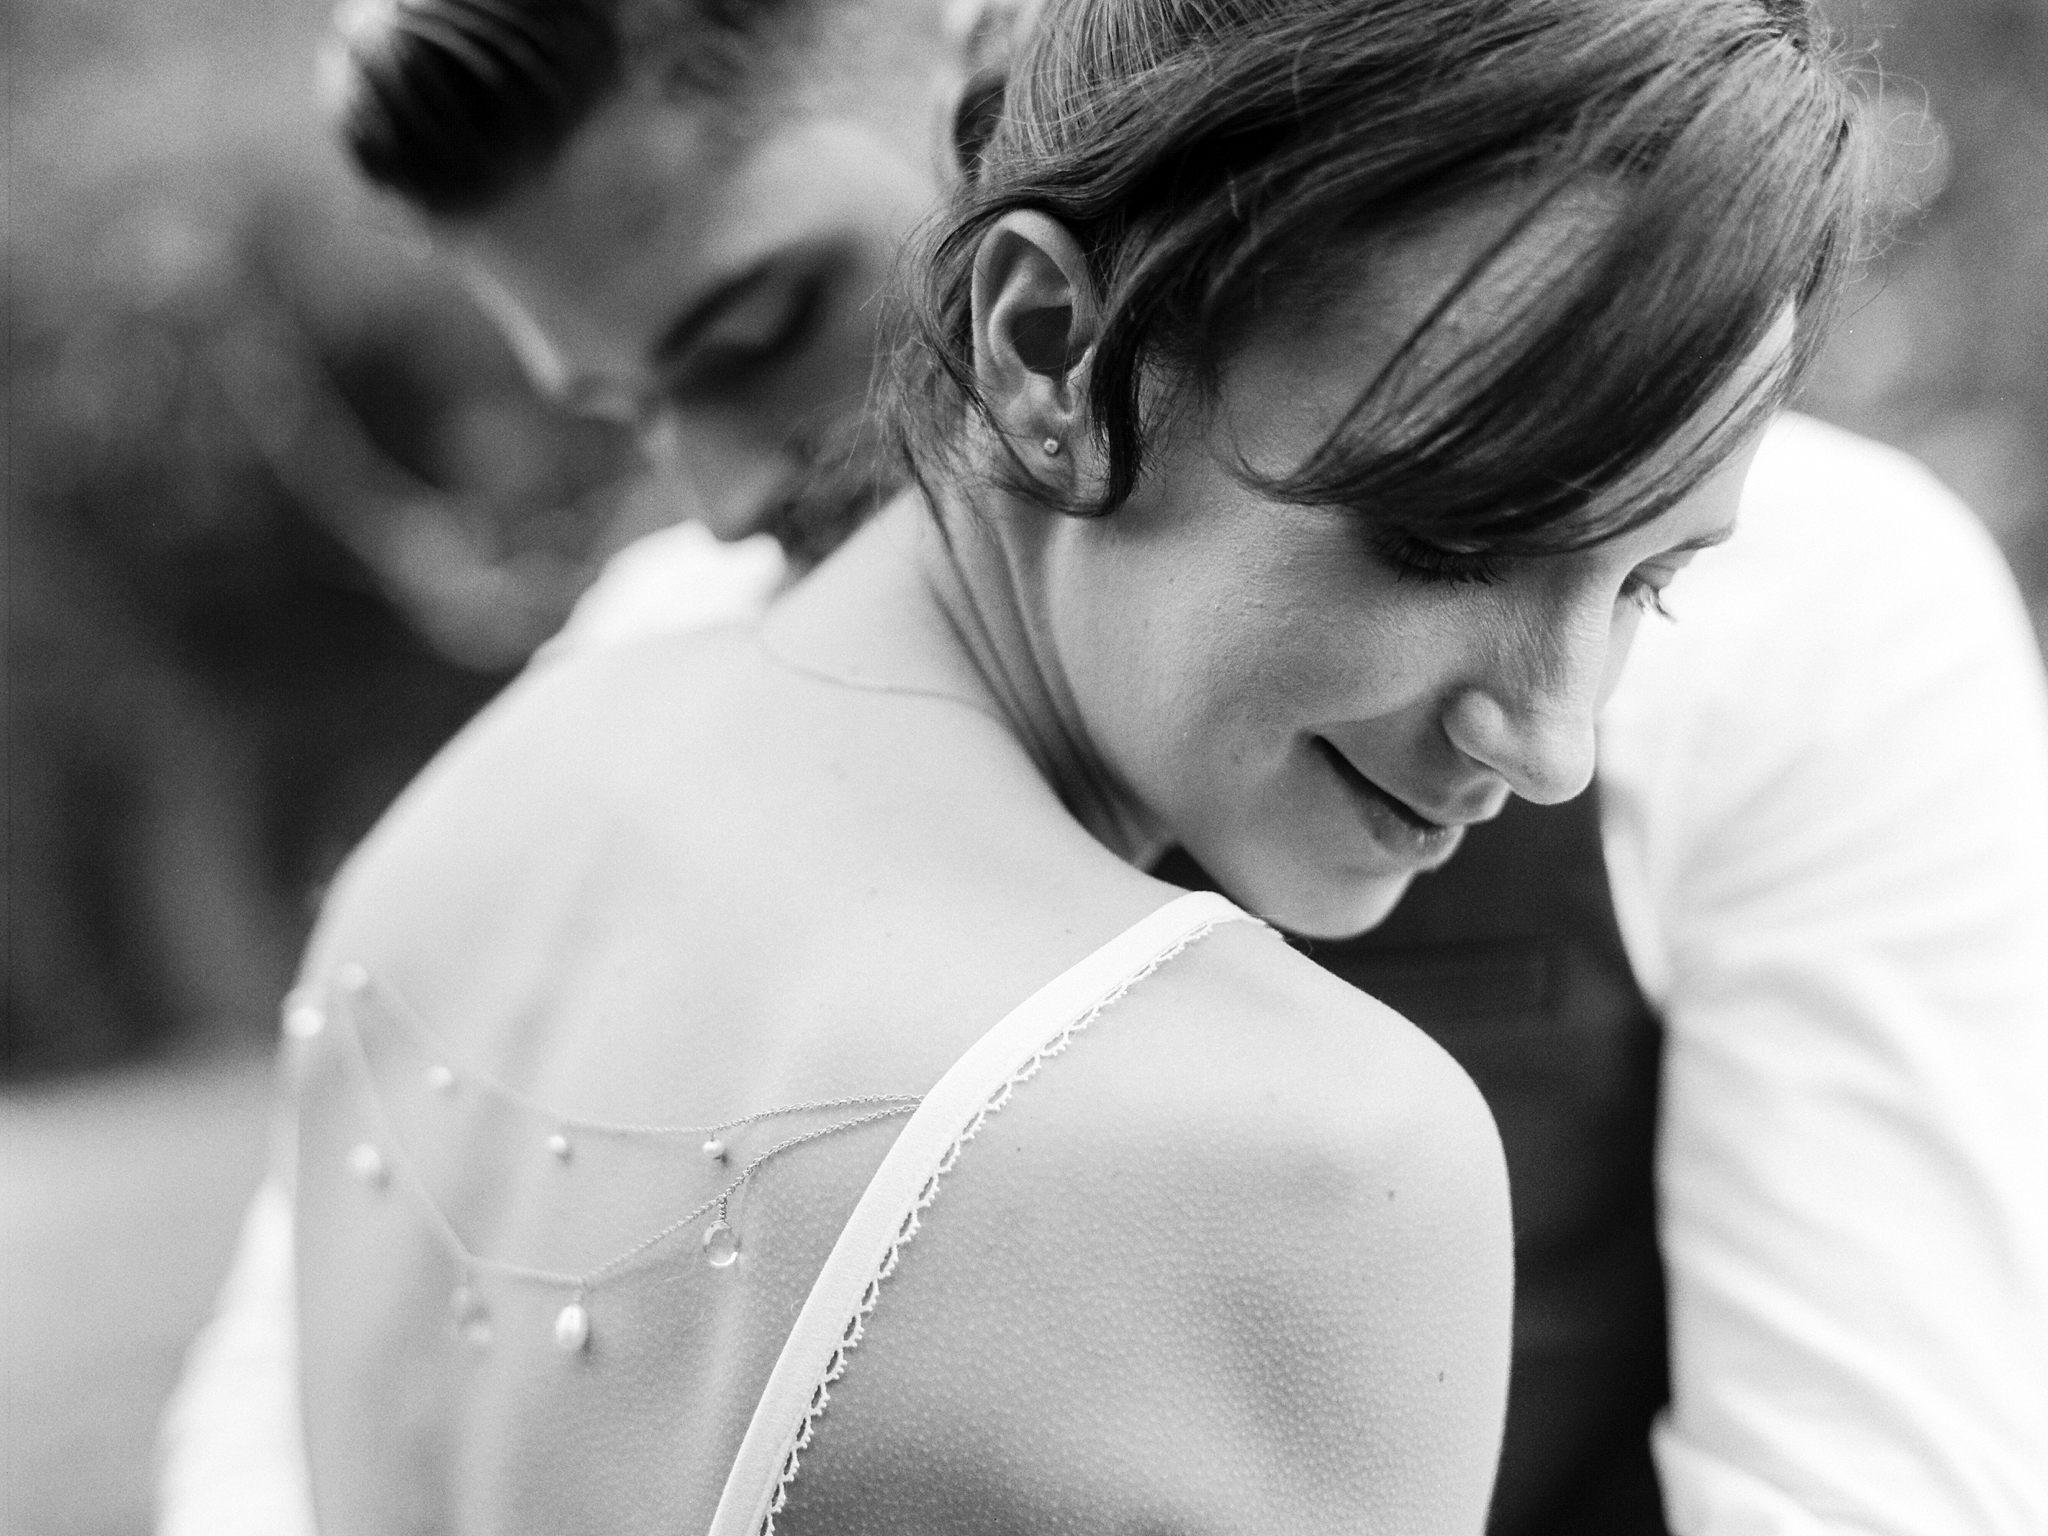 Mariage-a-la-maison-secall-hugo-hennequin-photographe-mariage-perpignan_0129.jpg